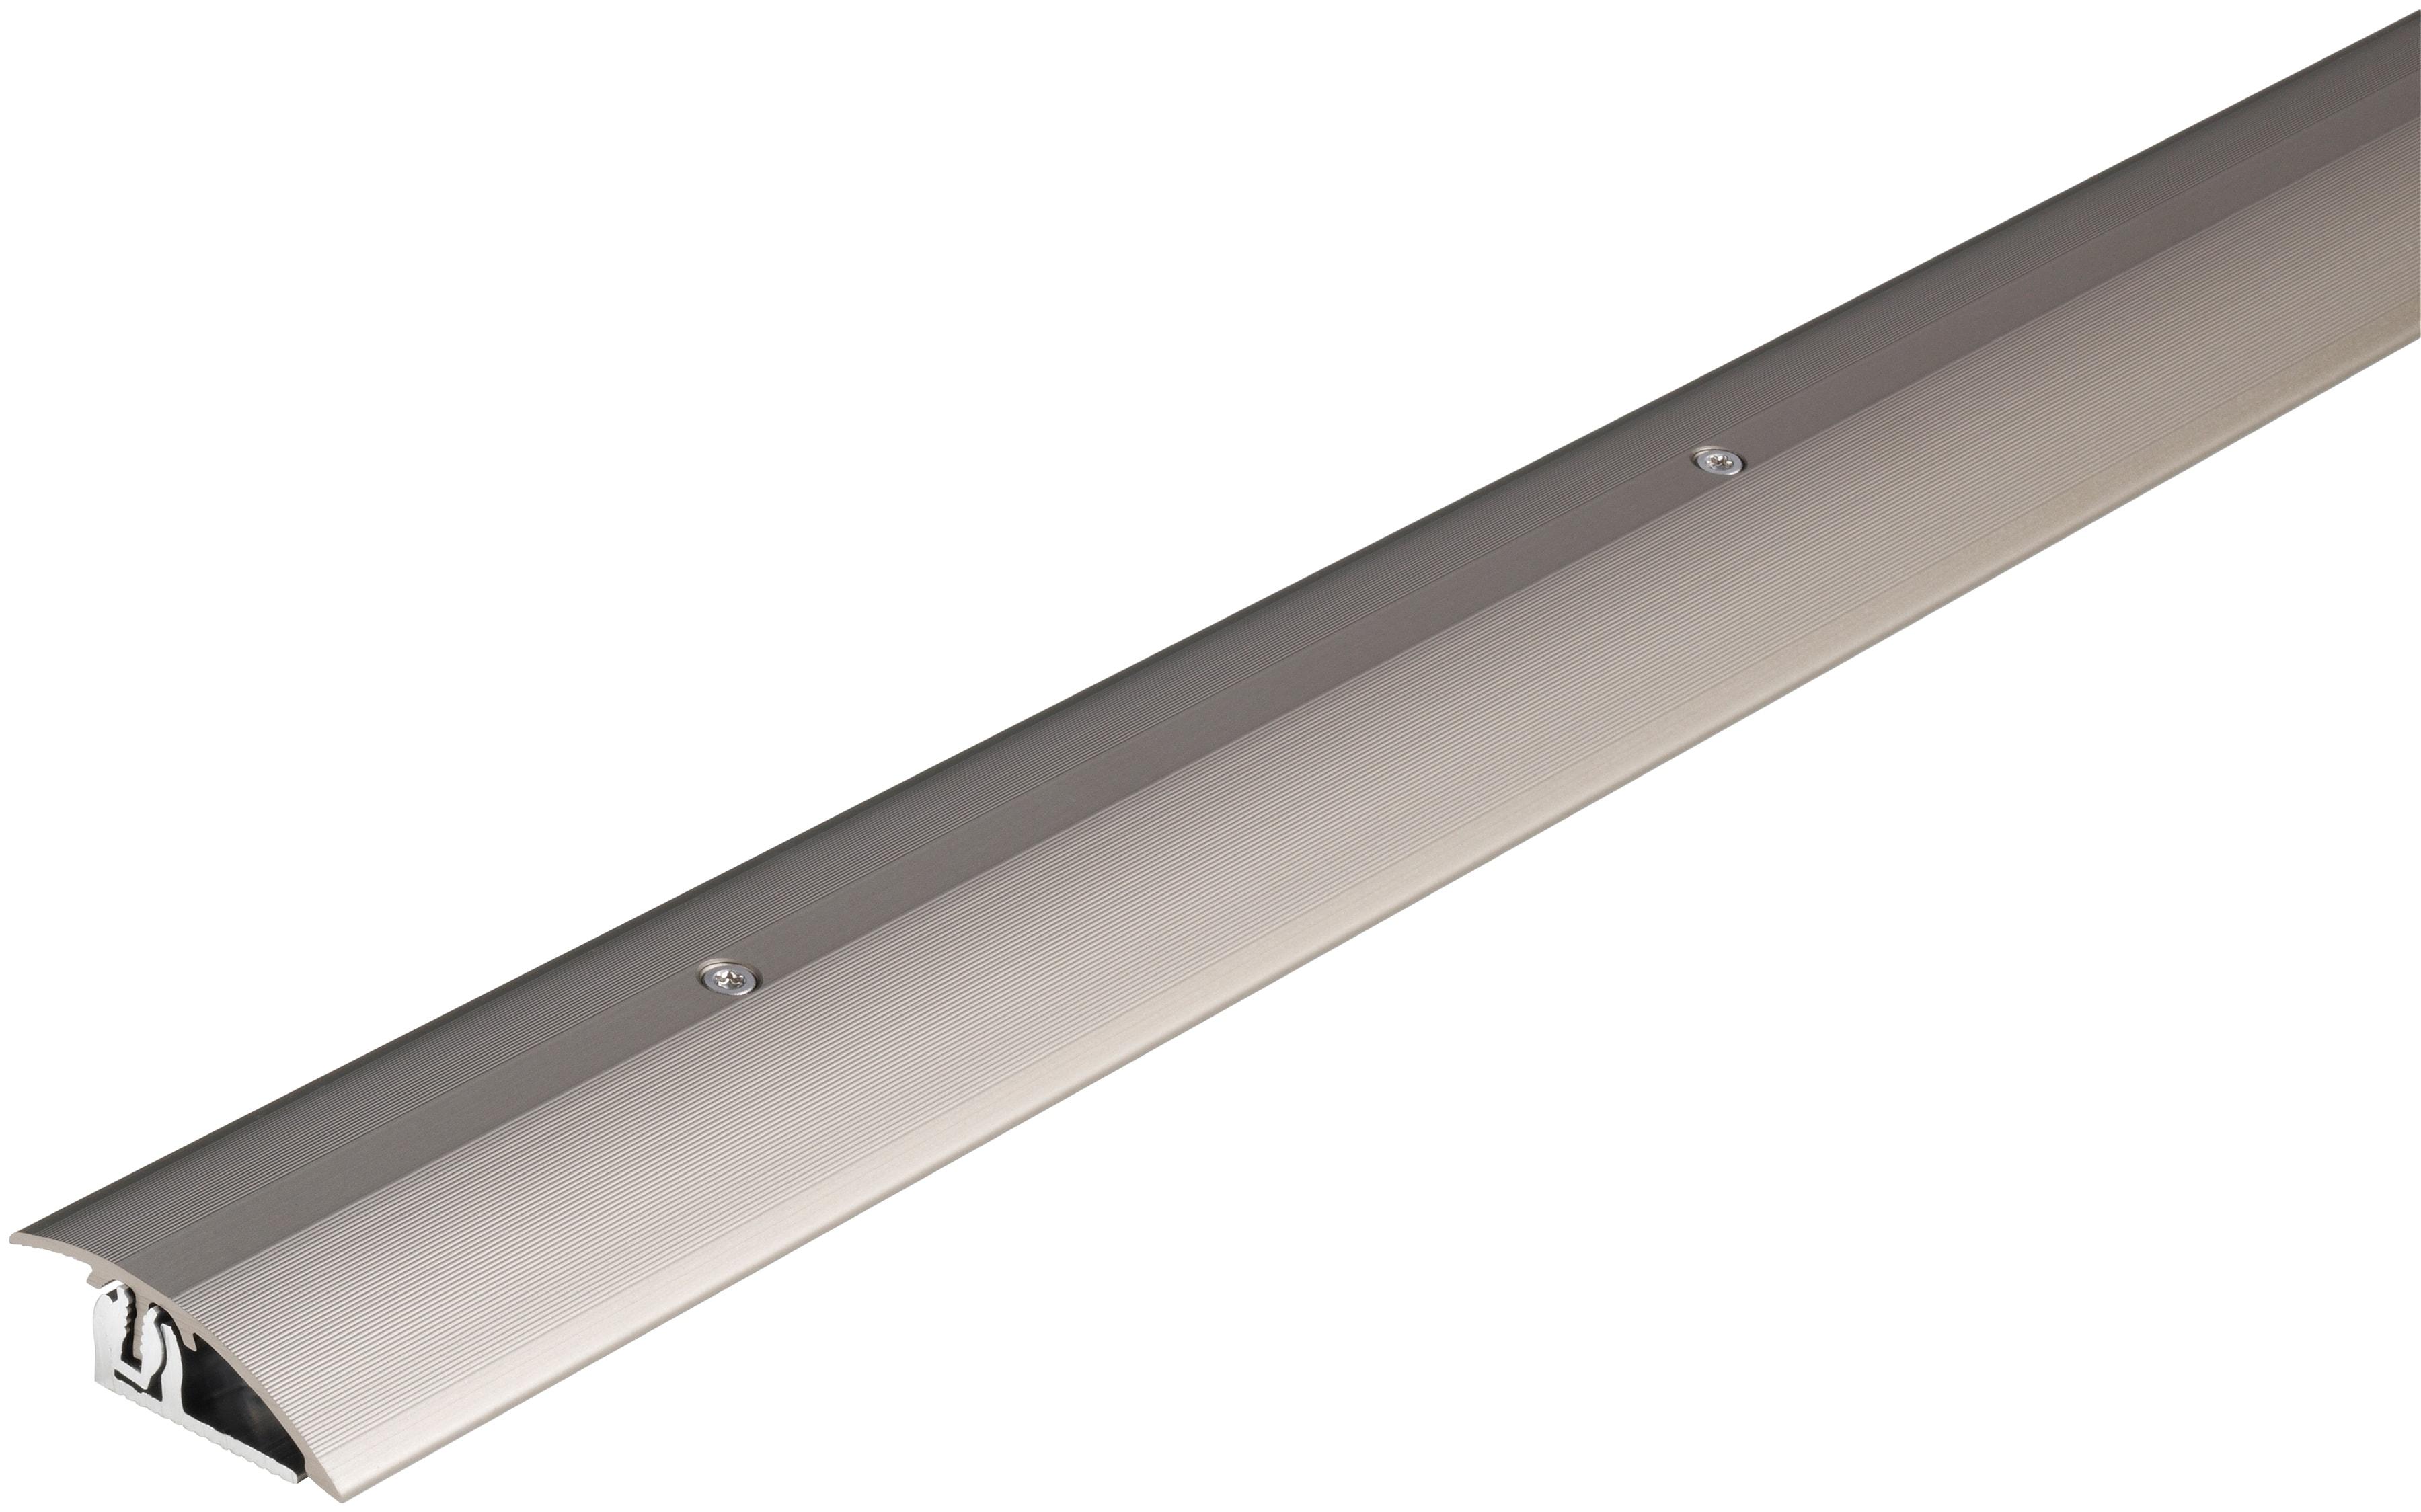 PARADOR Anpassungsprofil für Parkett   Baumarkt > Bodenbeläge > Parkett   Silberfarben   Aluminium   PARADOR